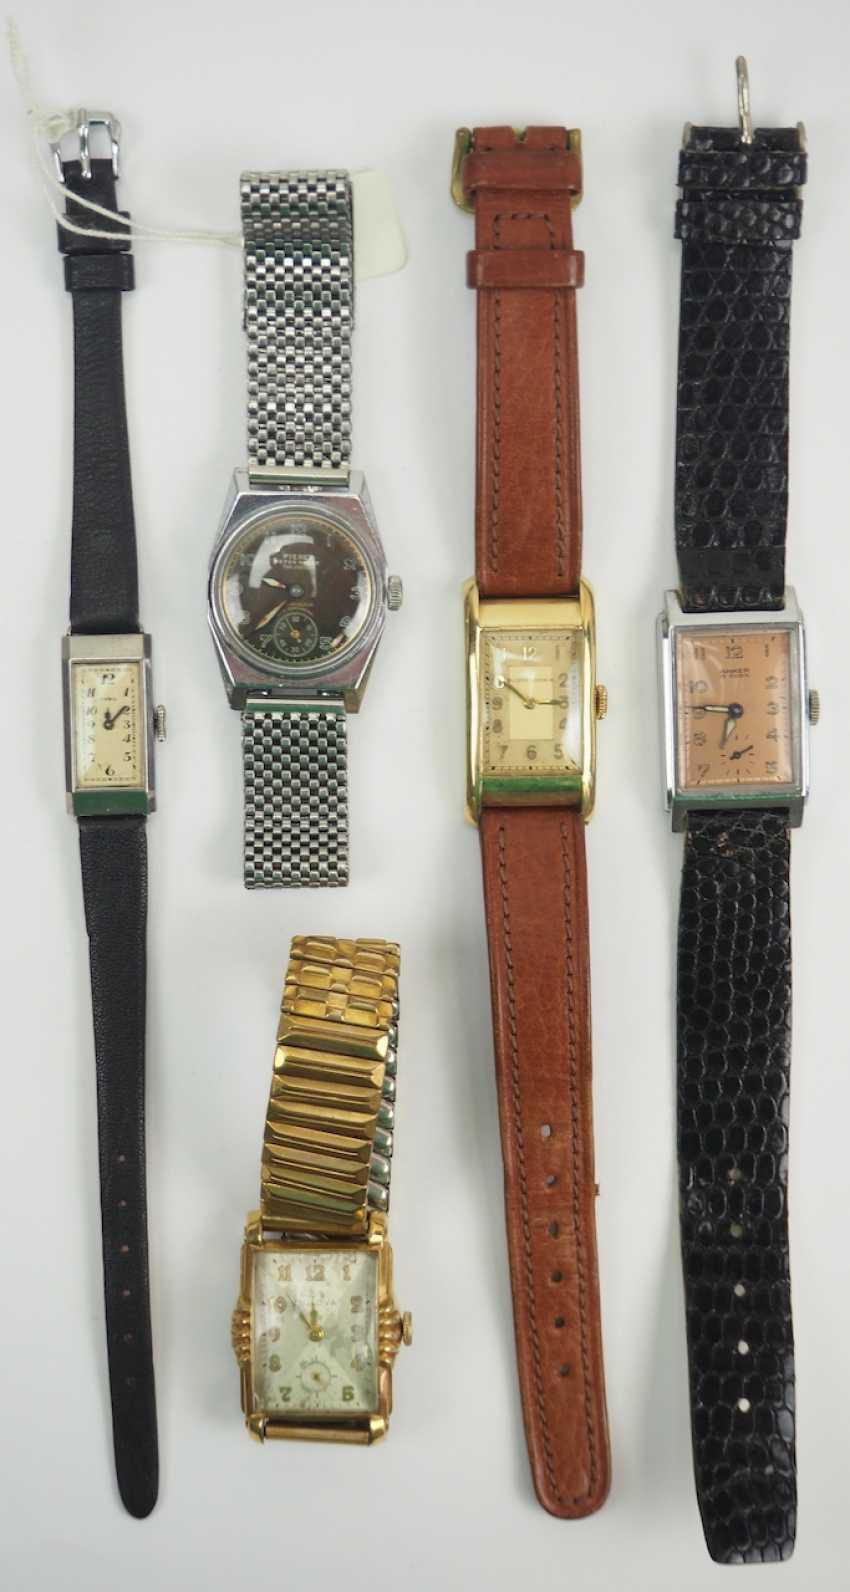 Lot of 5 ladies wrist watches. - photo 1